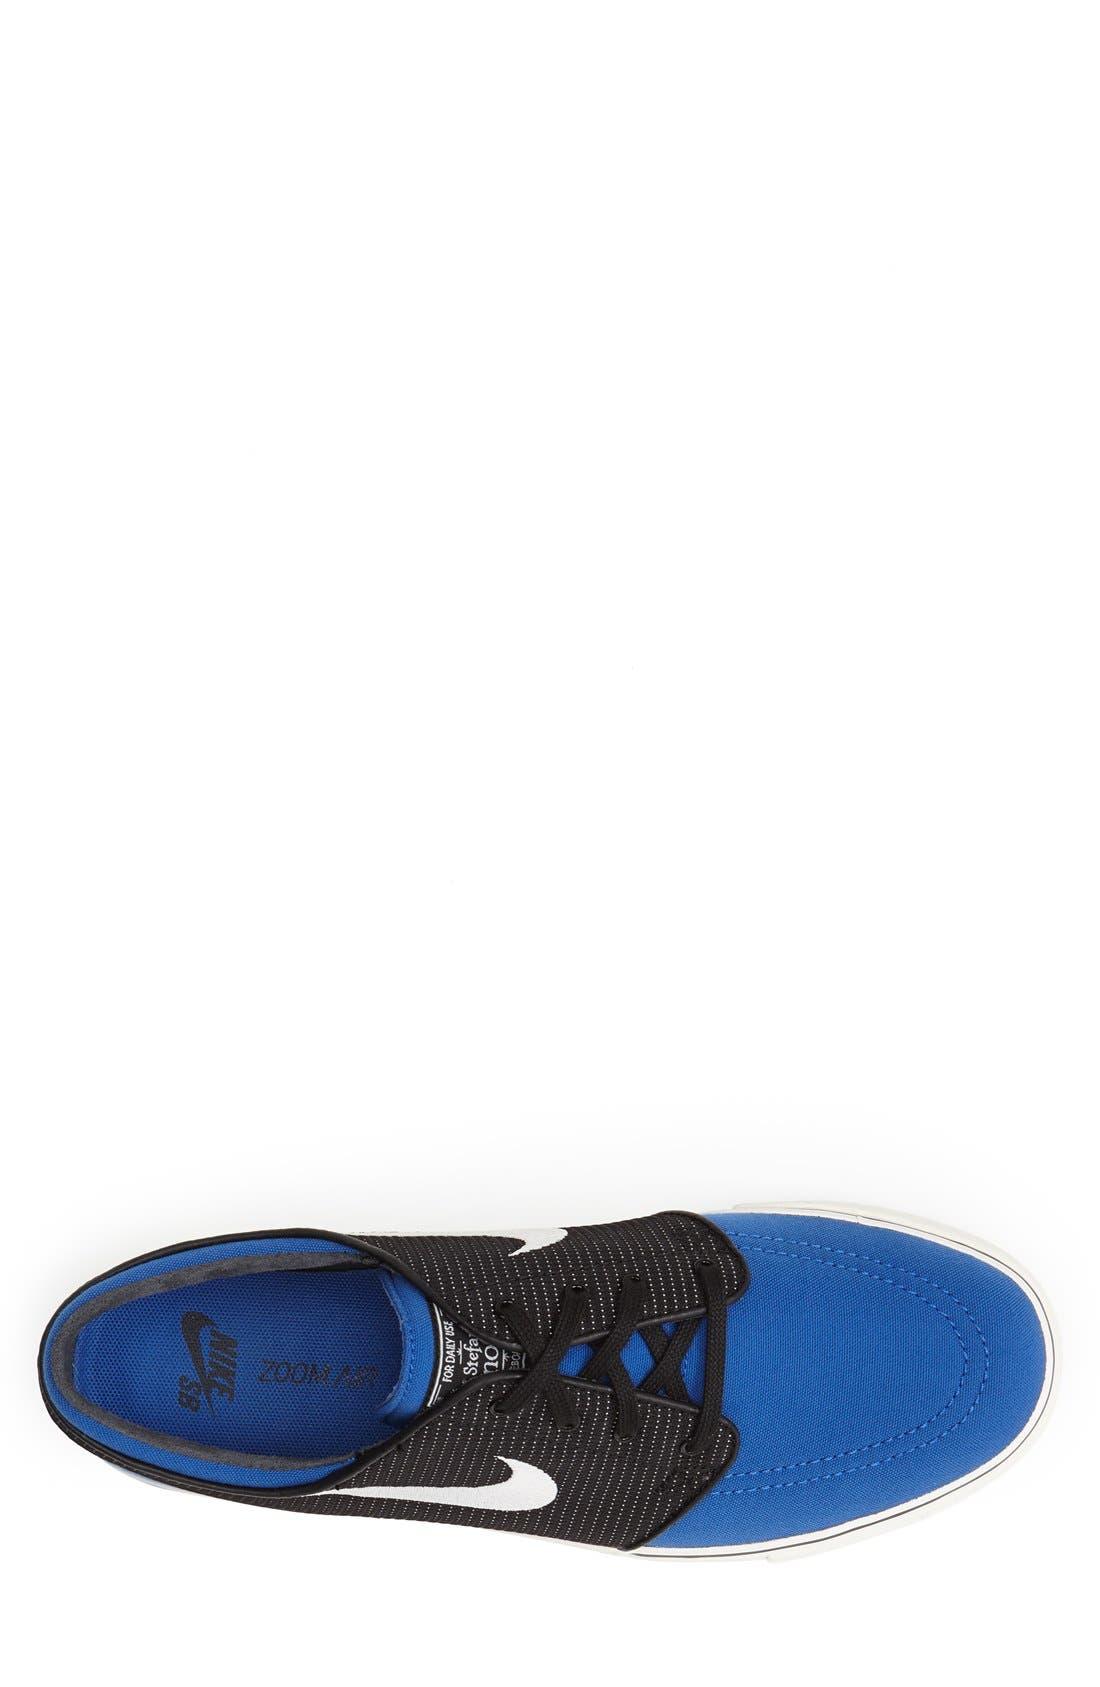 Zoom - Stefan Janoski SB Canvas Skate Shoe,                             Alternate thumbnail 162, color,